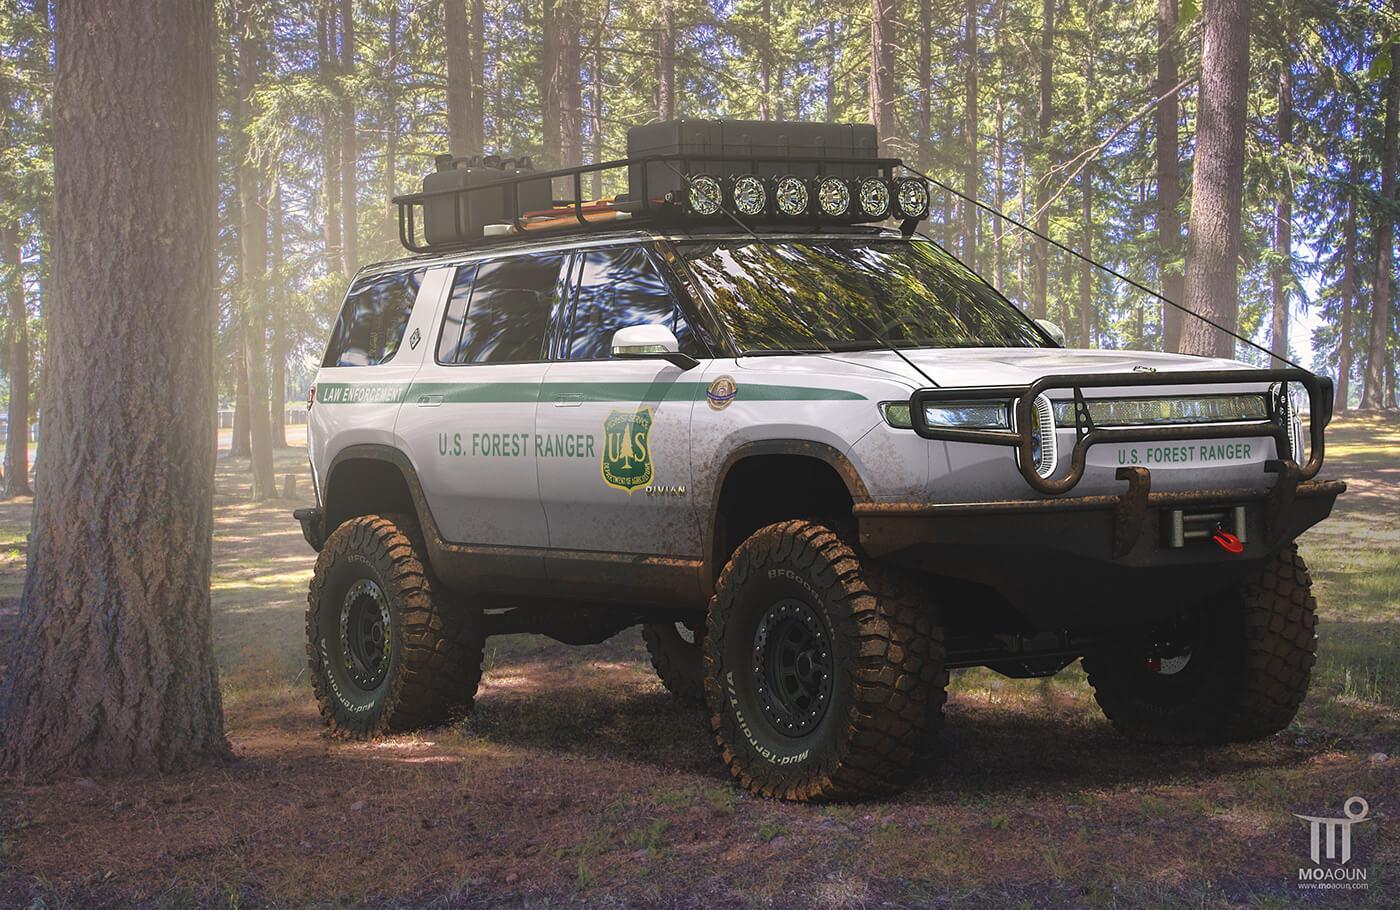 Rivian R1S Forest Ranger Edition